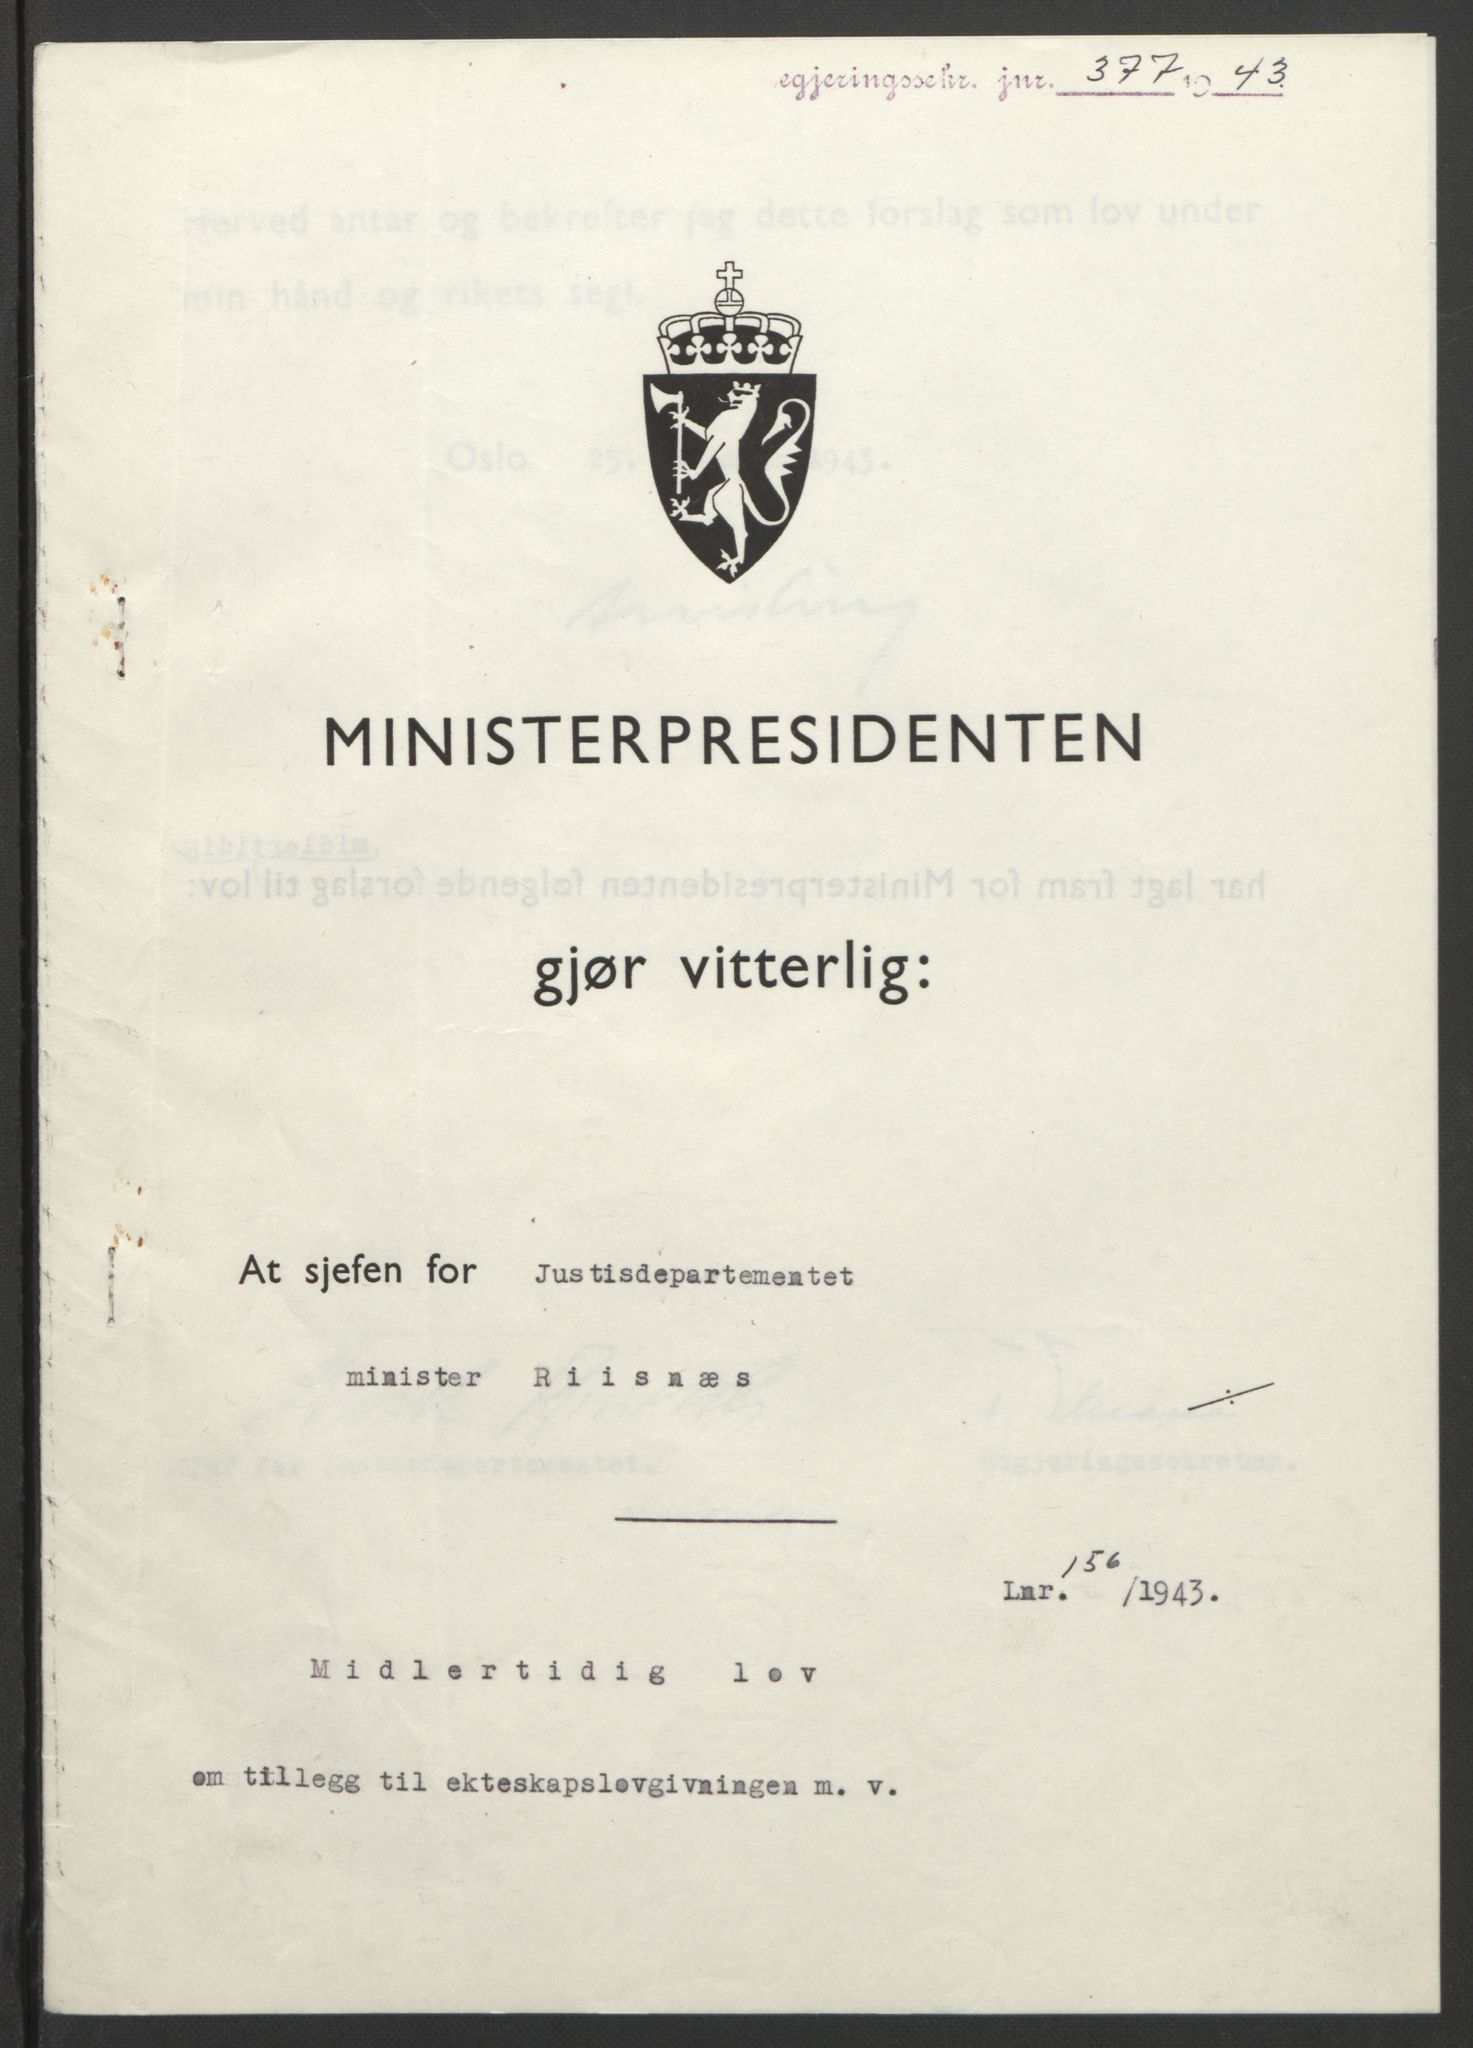 RA, NS-administrasjonen 1940-1945 (Statsrådsekretariatet, de kommisariske statsråder mm), D/Db/L0099: Lover, 1943, s. 739